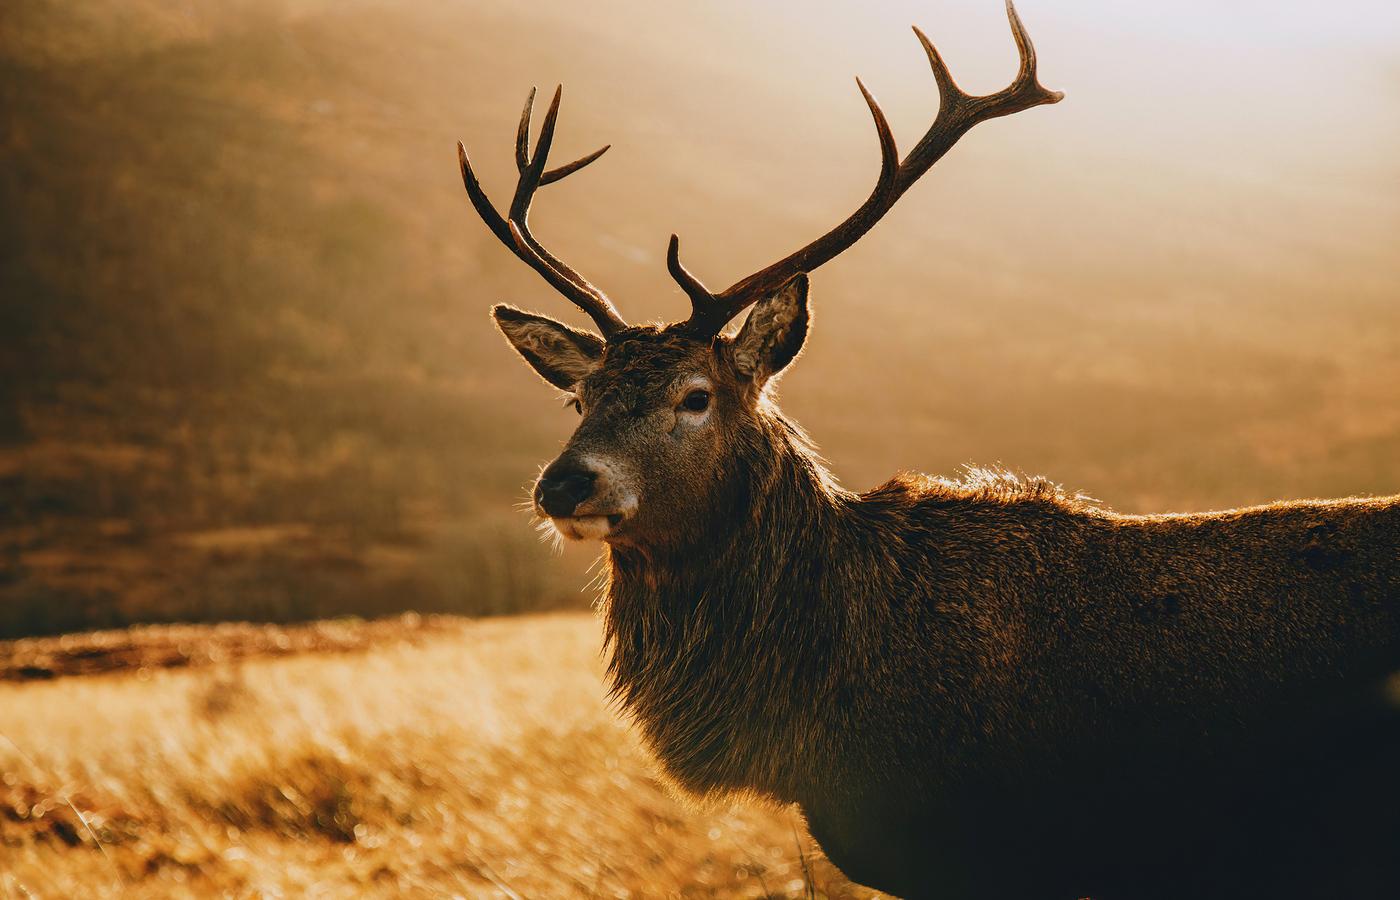 deer-morning-landscape-4k-87.jpg